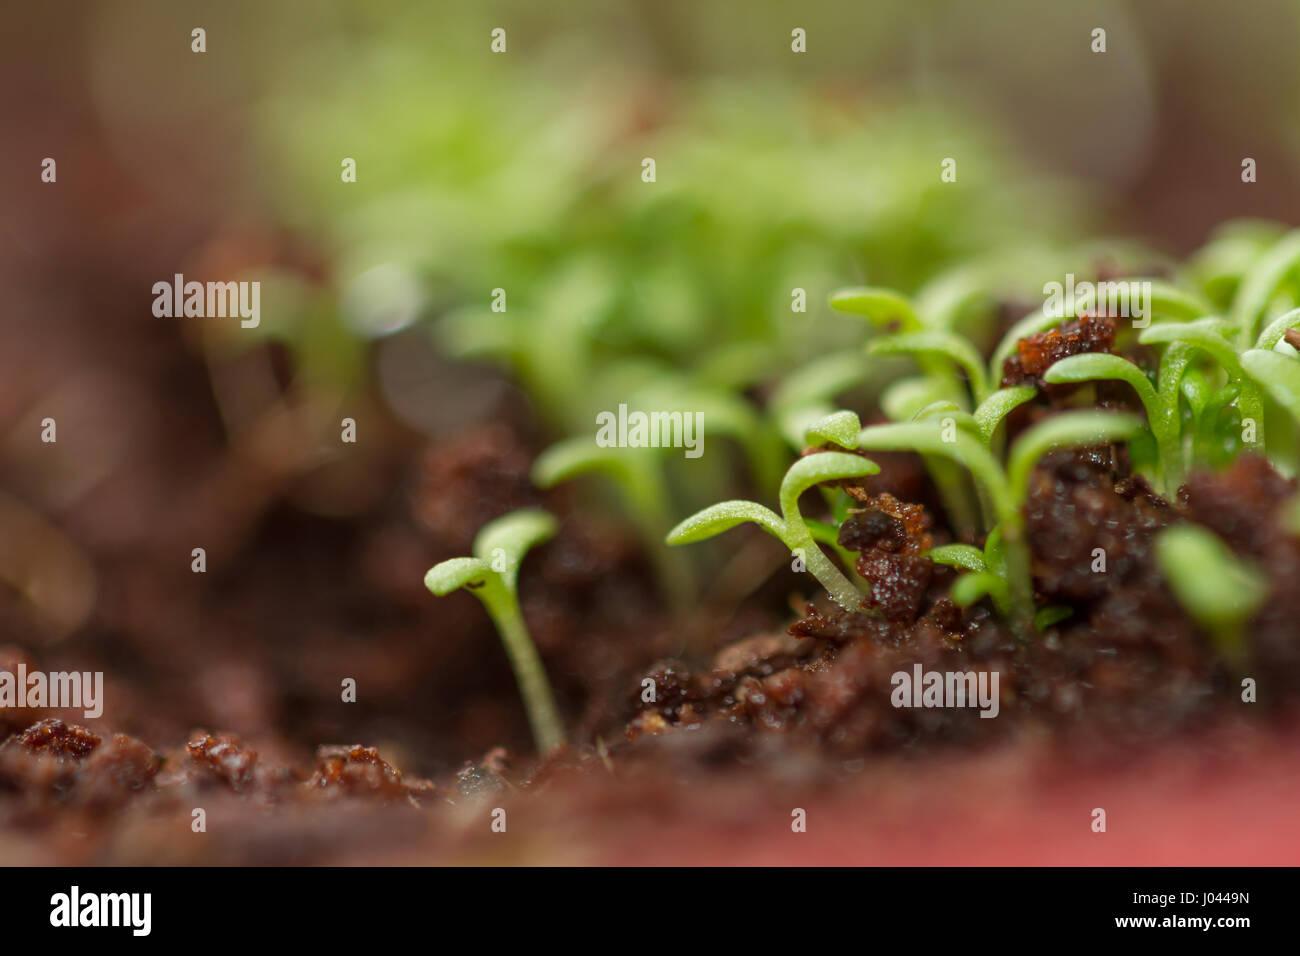 Camomille verte des pousses. Cress sprouts Photo Stock